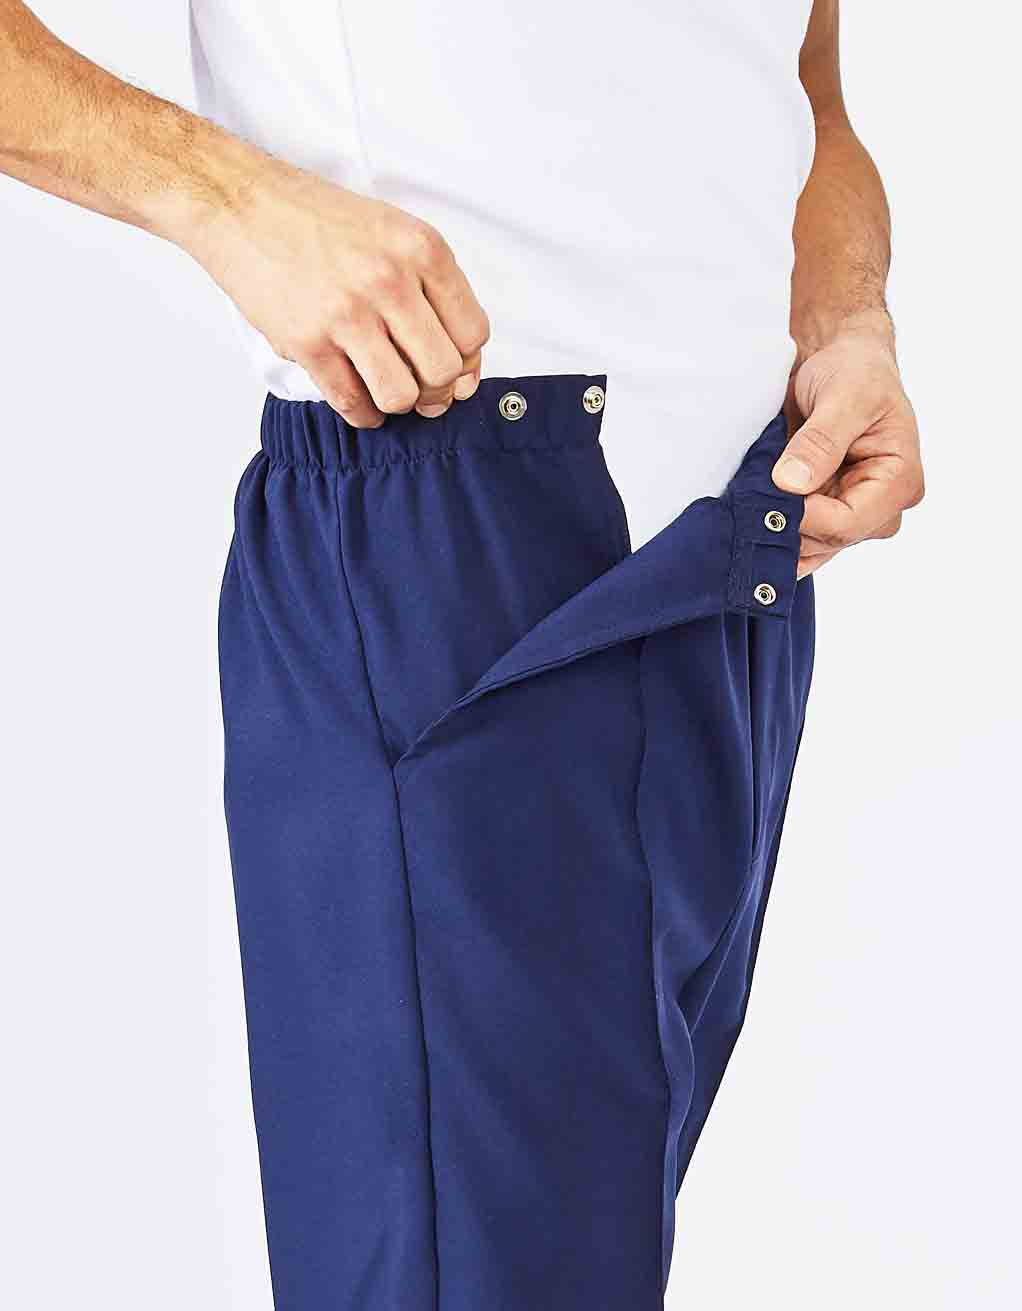 pantalon adapt taille lastique z. Black Bedroom Furniture Sets. Home Design Ideas